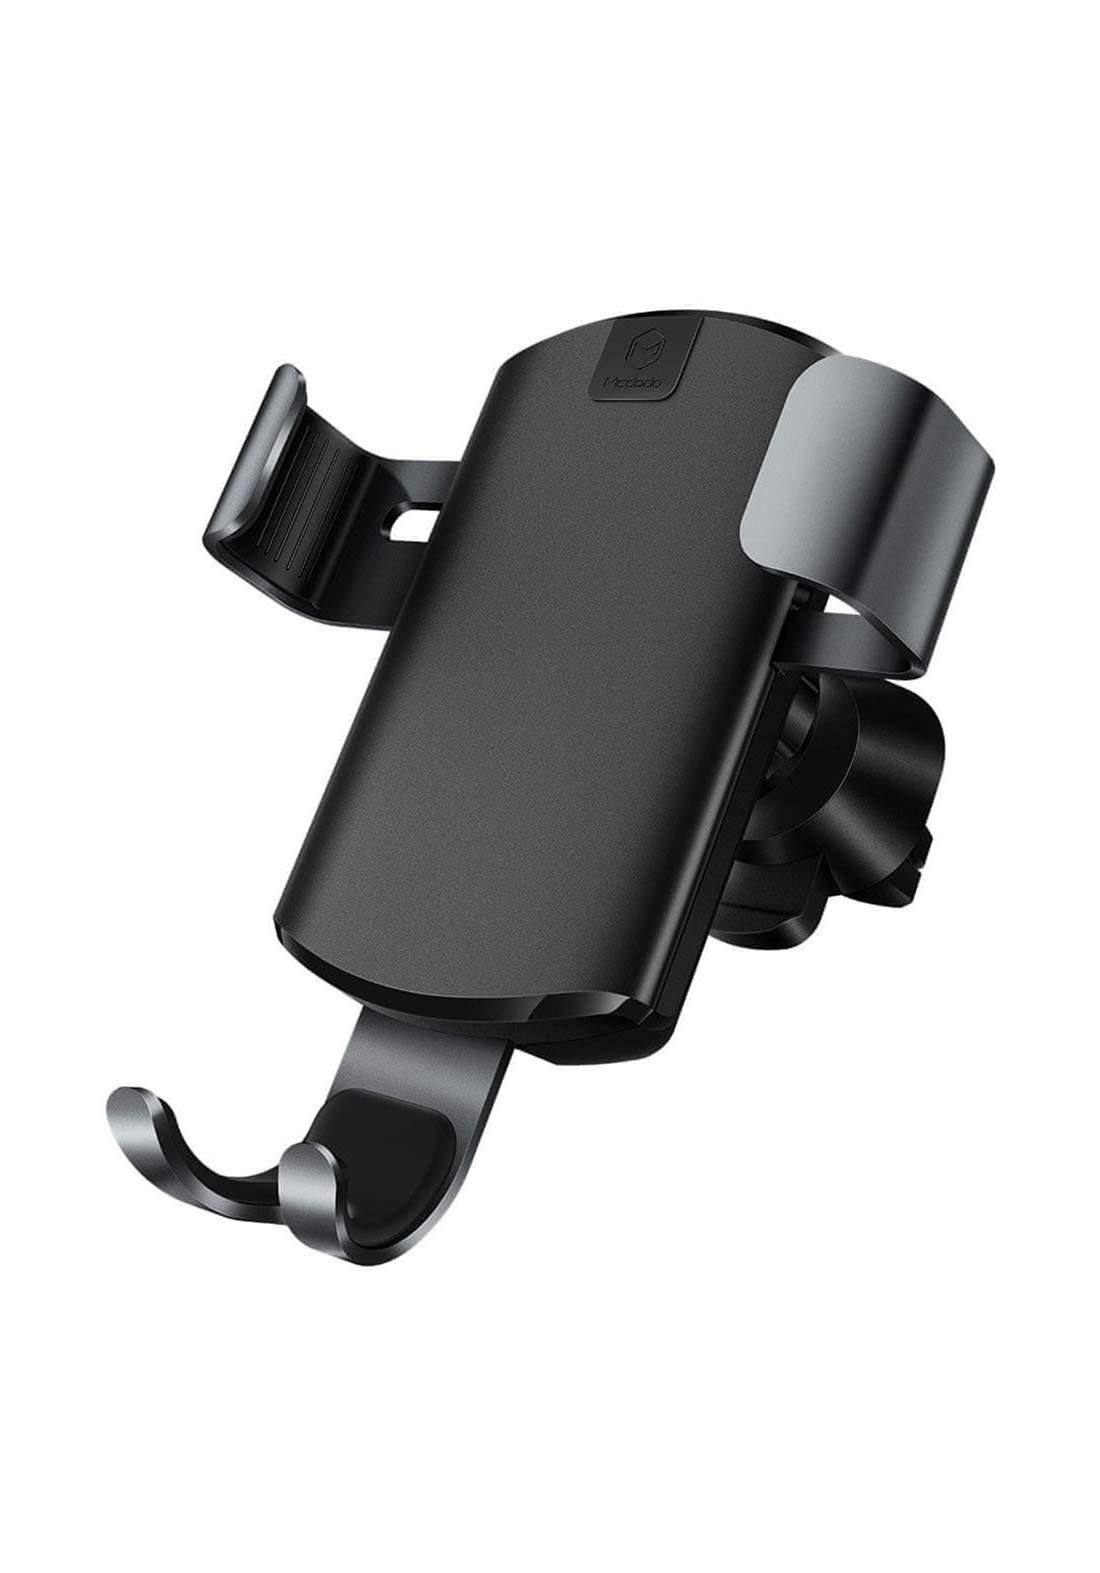 (11438)Mcdodo CH-5181 7.5 W / 10 W Gravity Wireless Charger - Black شاحن موبايل للسيارة